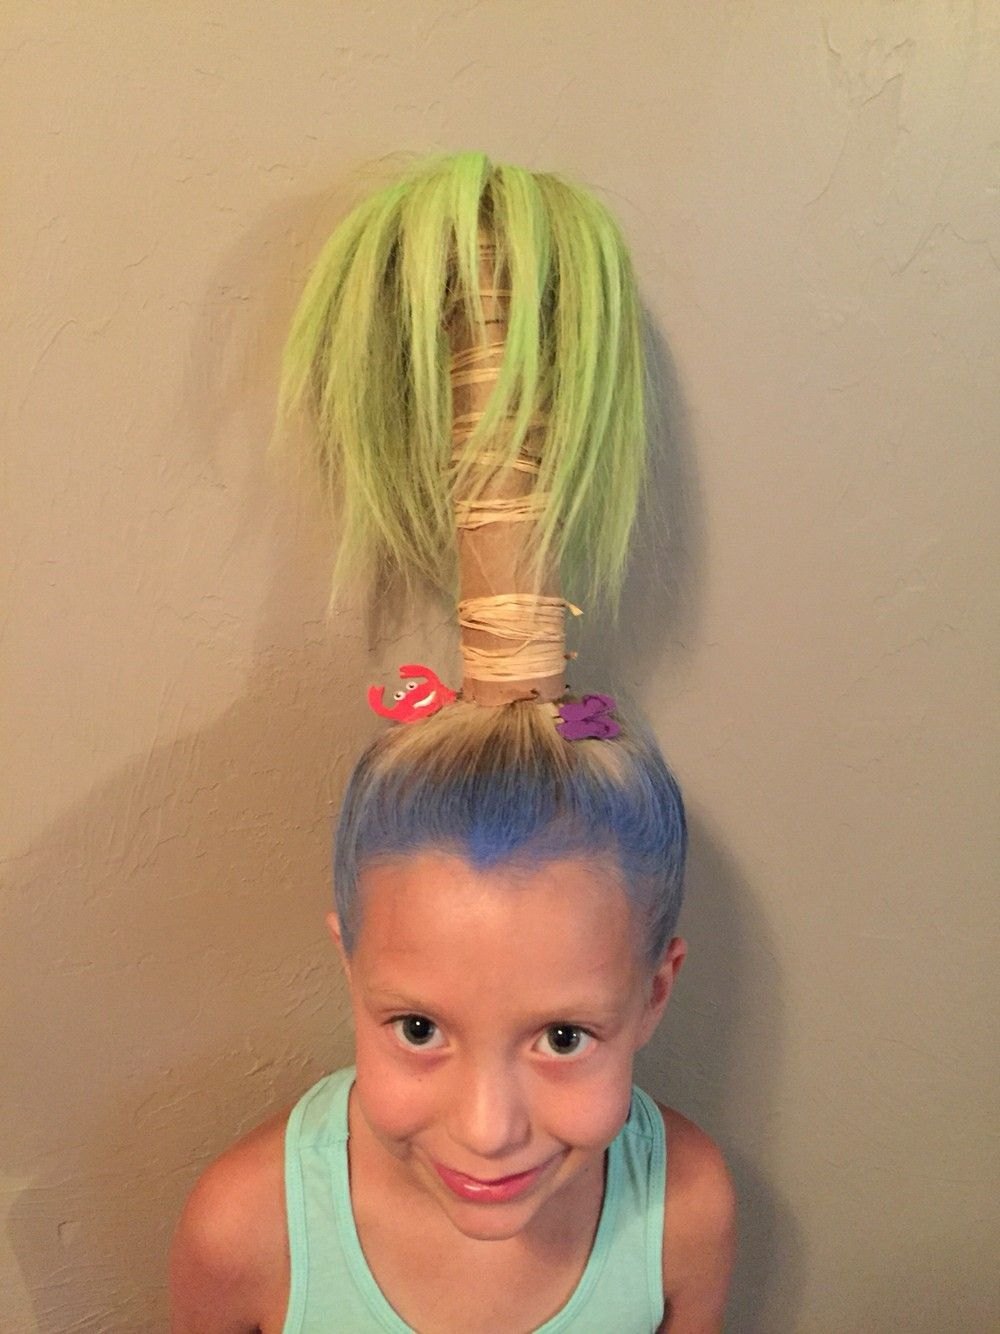 Palm Tree Crazy Hair Day At School Wacky Hair Days Wacky Hair